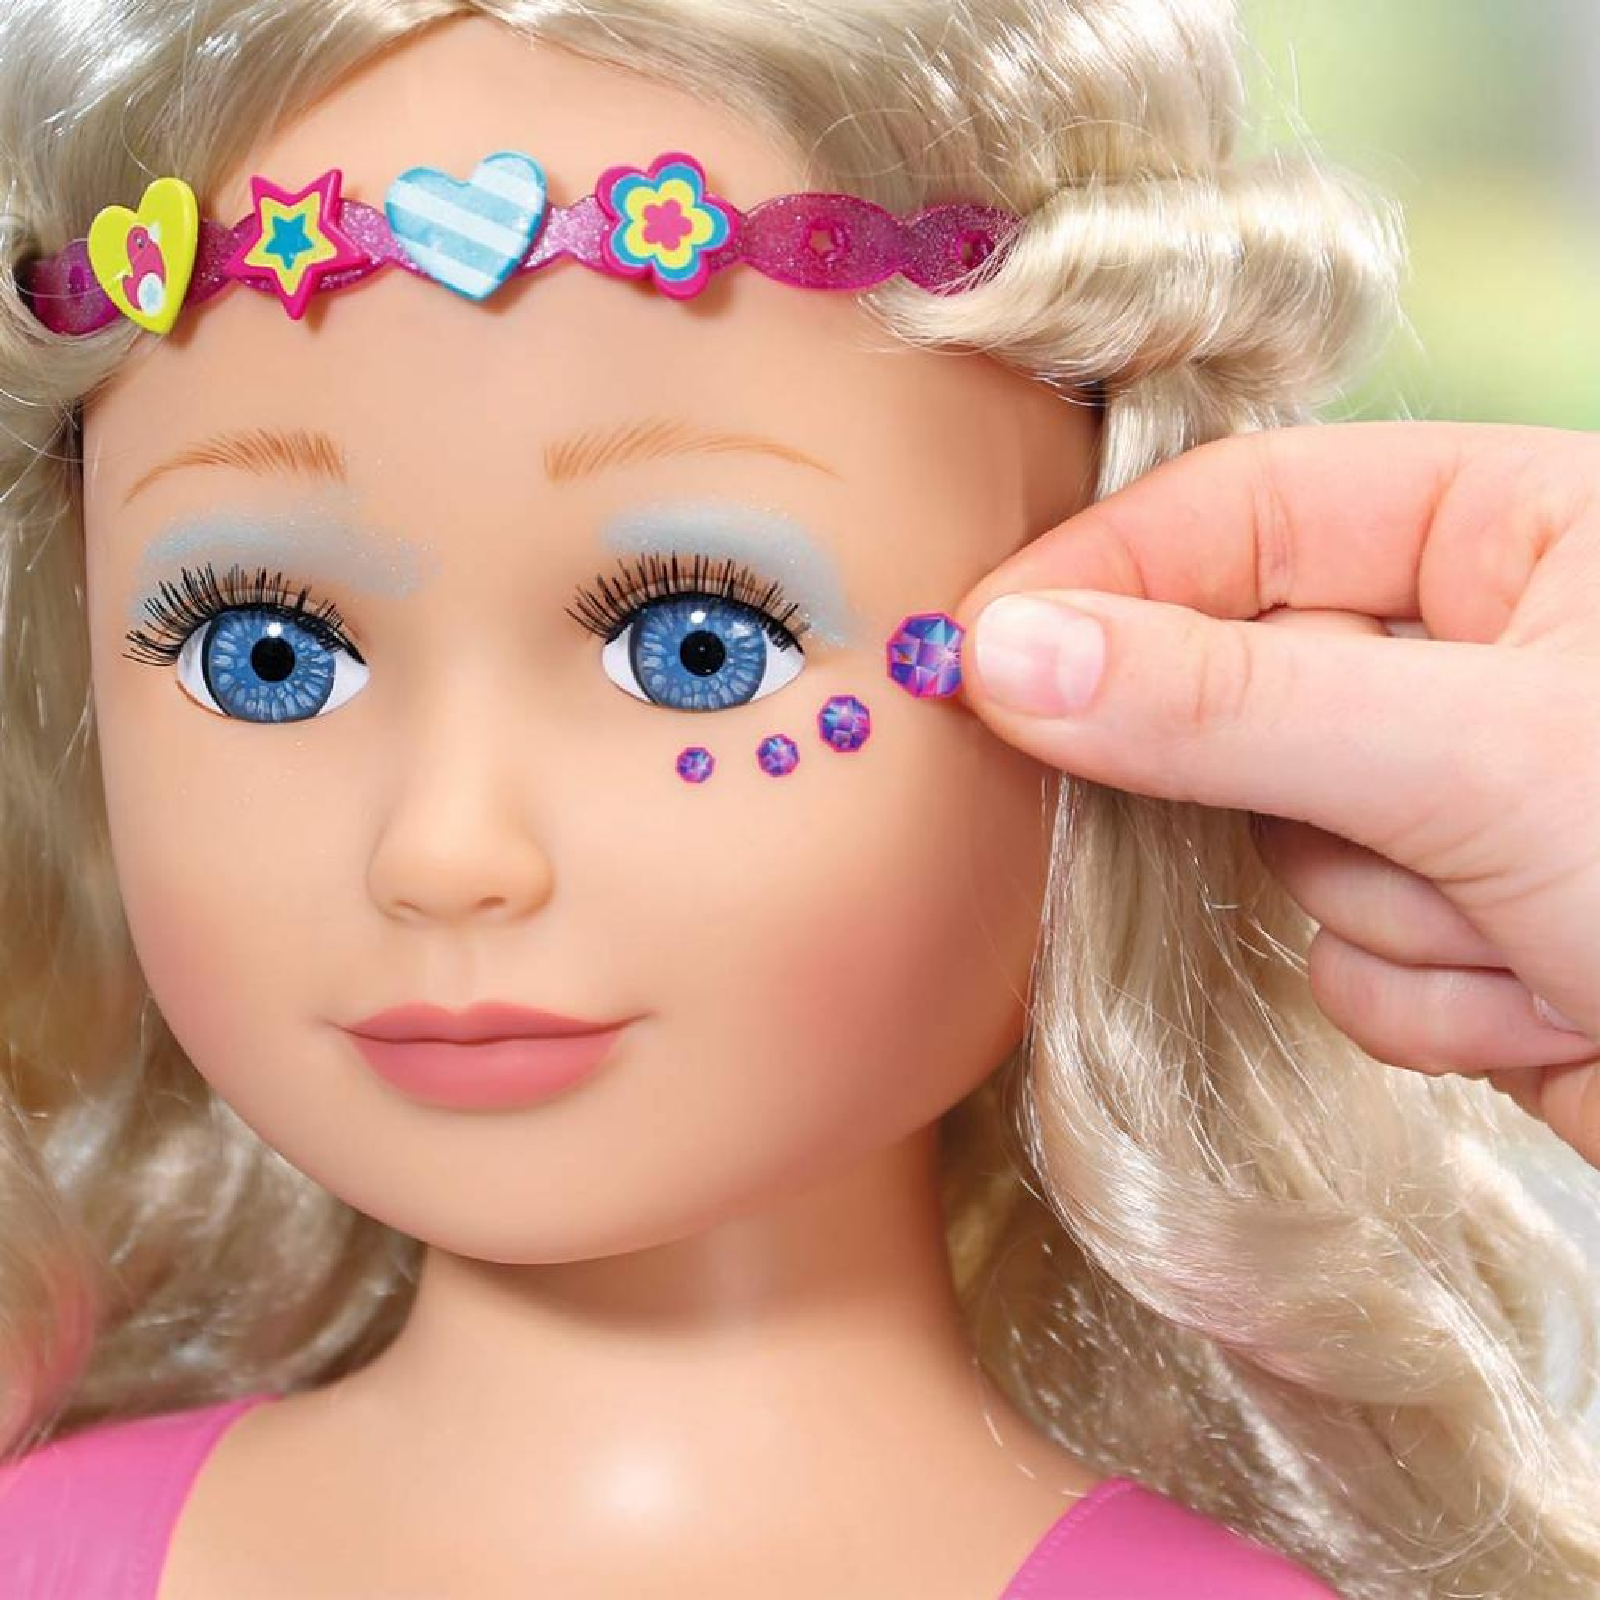 Кукла Zapf манекен My Model Сестричка с аксессуарами (824788) изображение 8